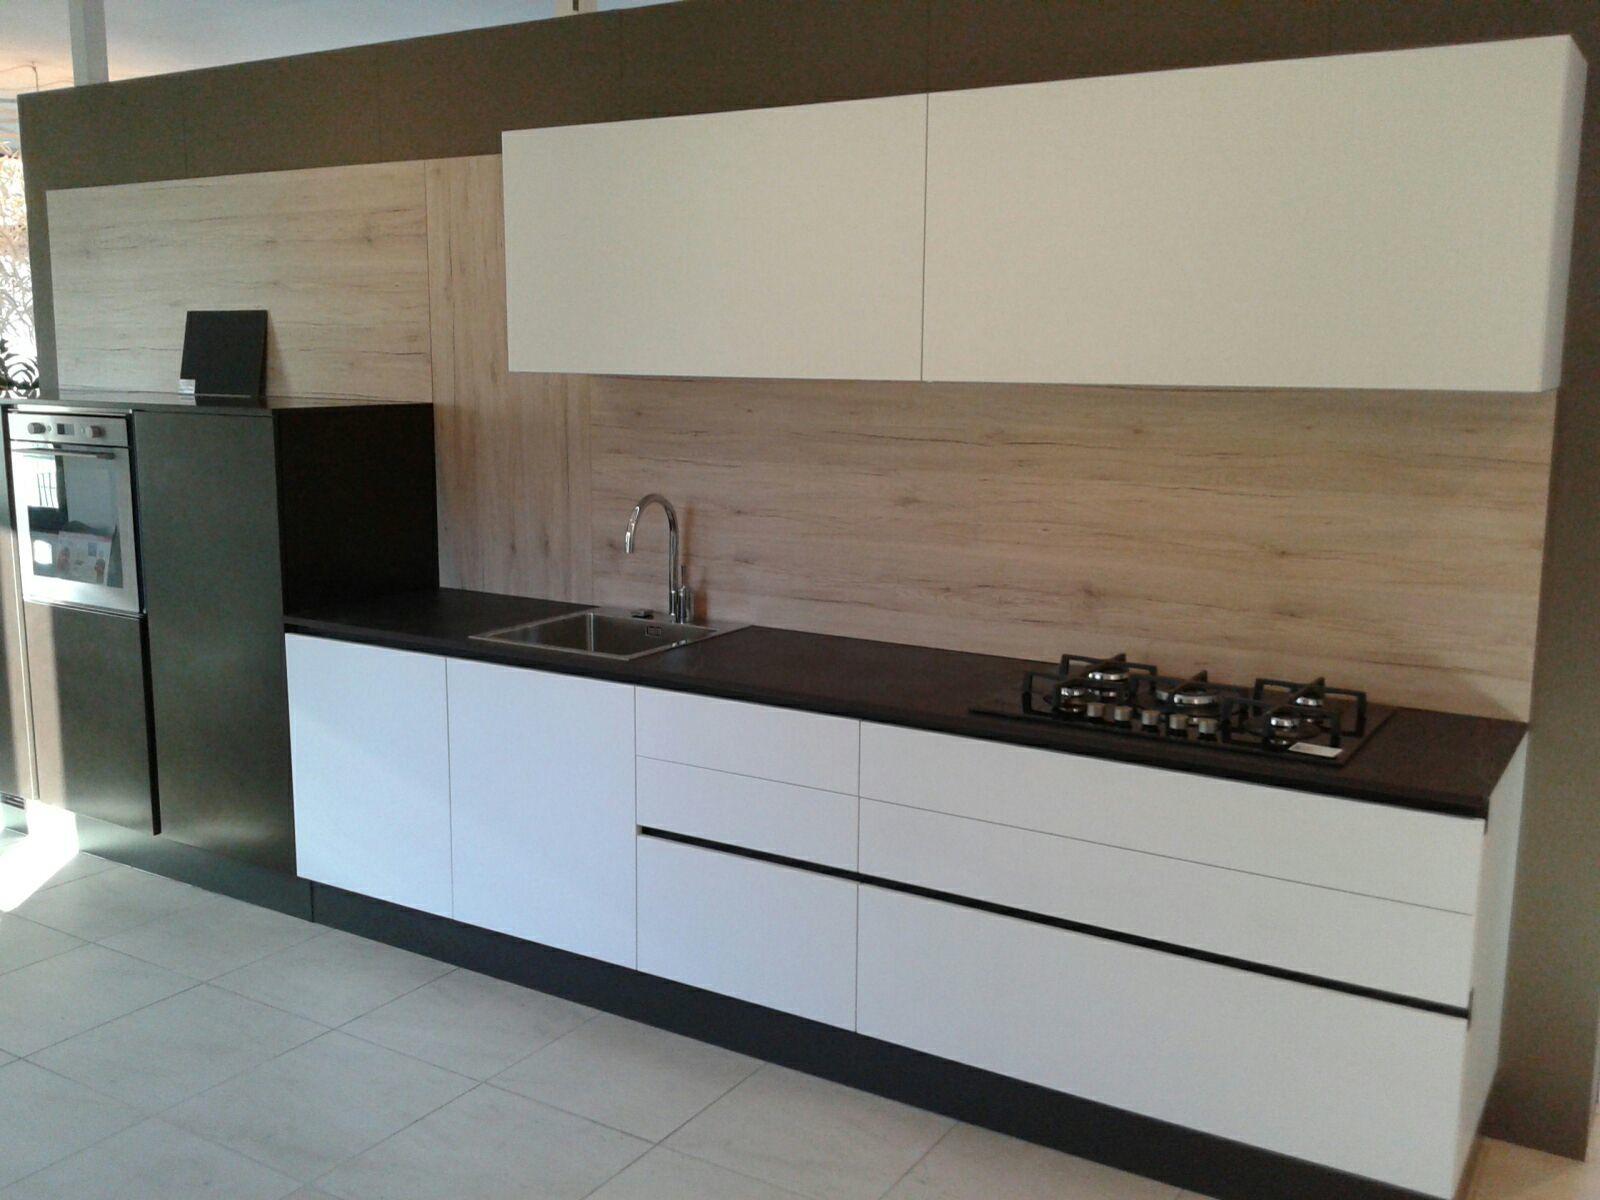 MOOD - Cucina bicolor bianca e nera - CUCINE COMPOSIT